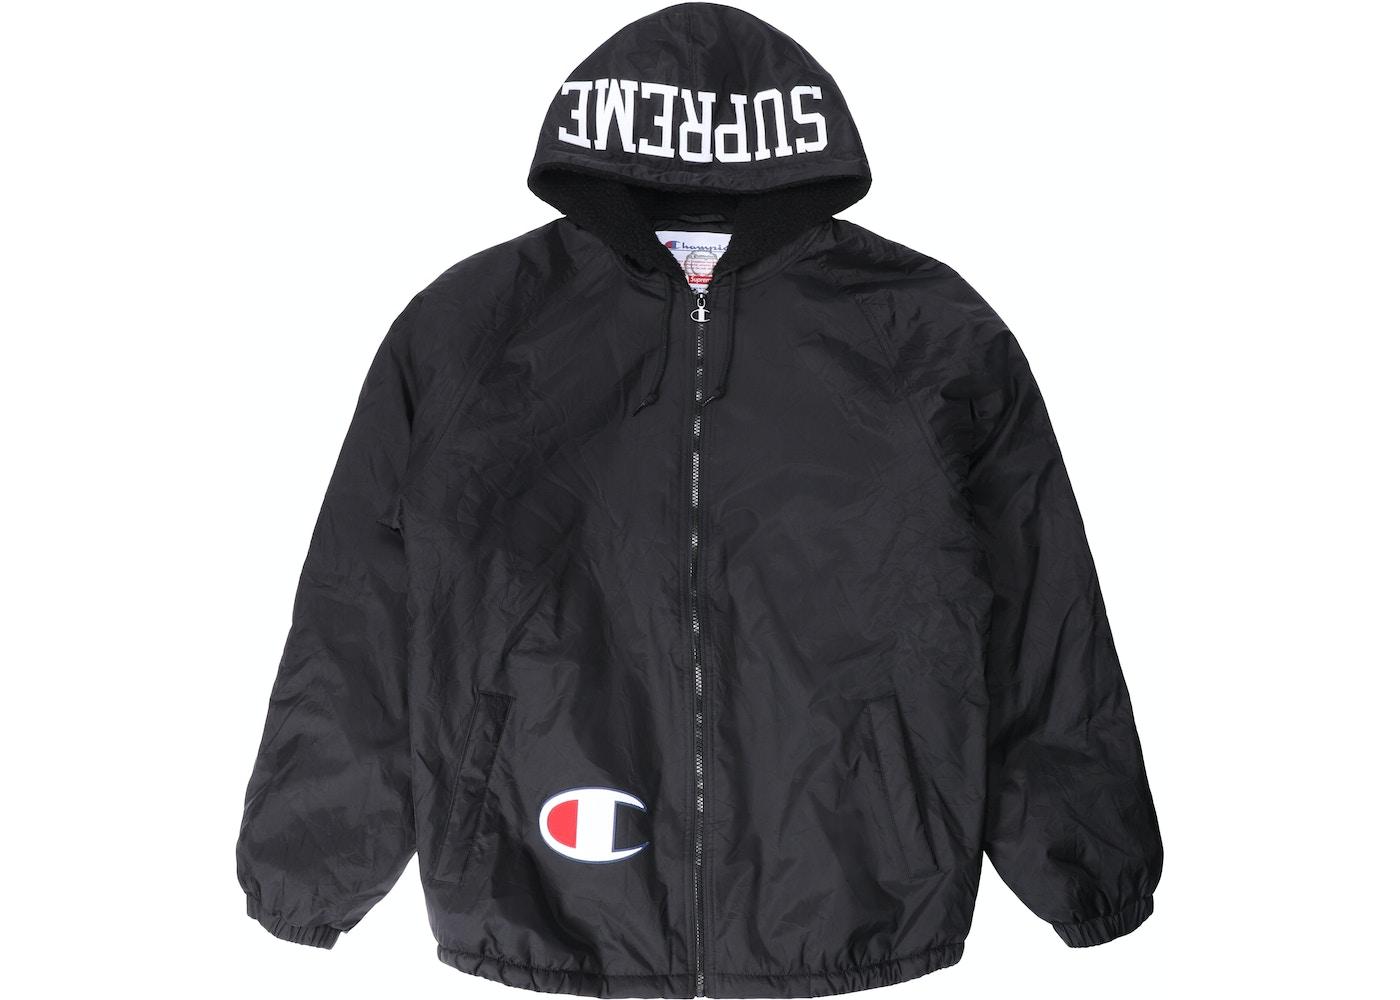 f9778f7ecde62 Supreme Champion Sherpa Lined Hooded Jacket Black - FW17